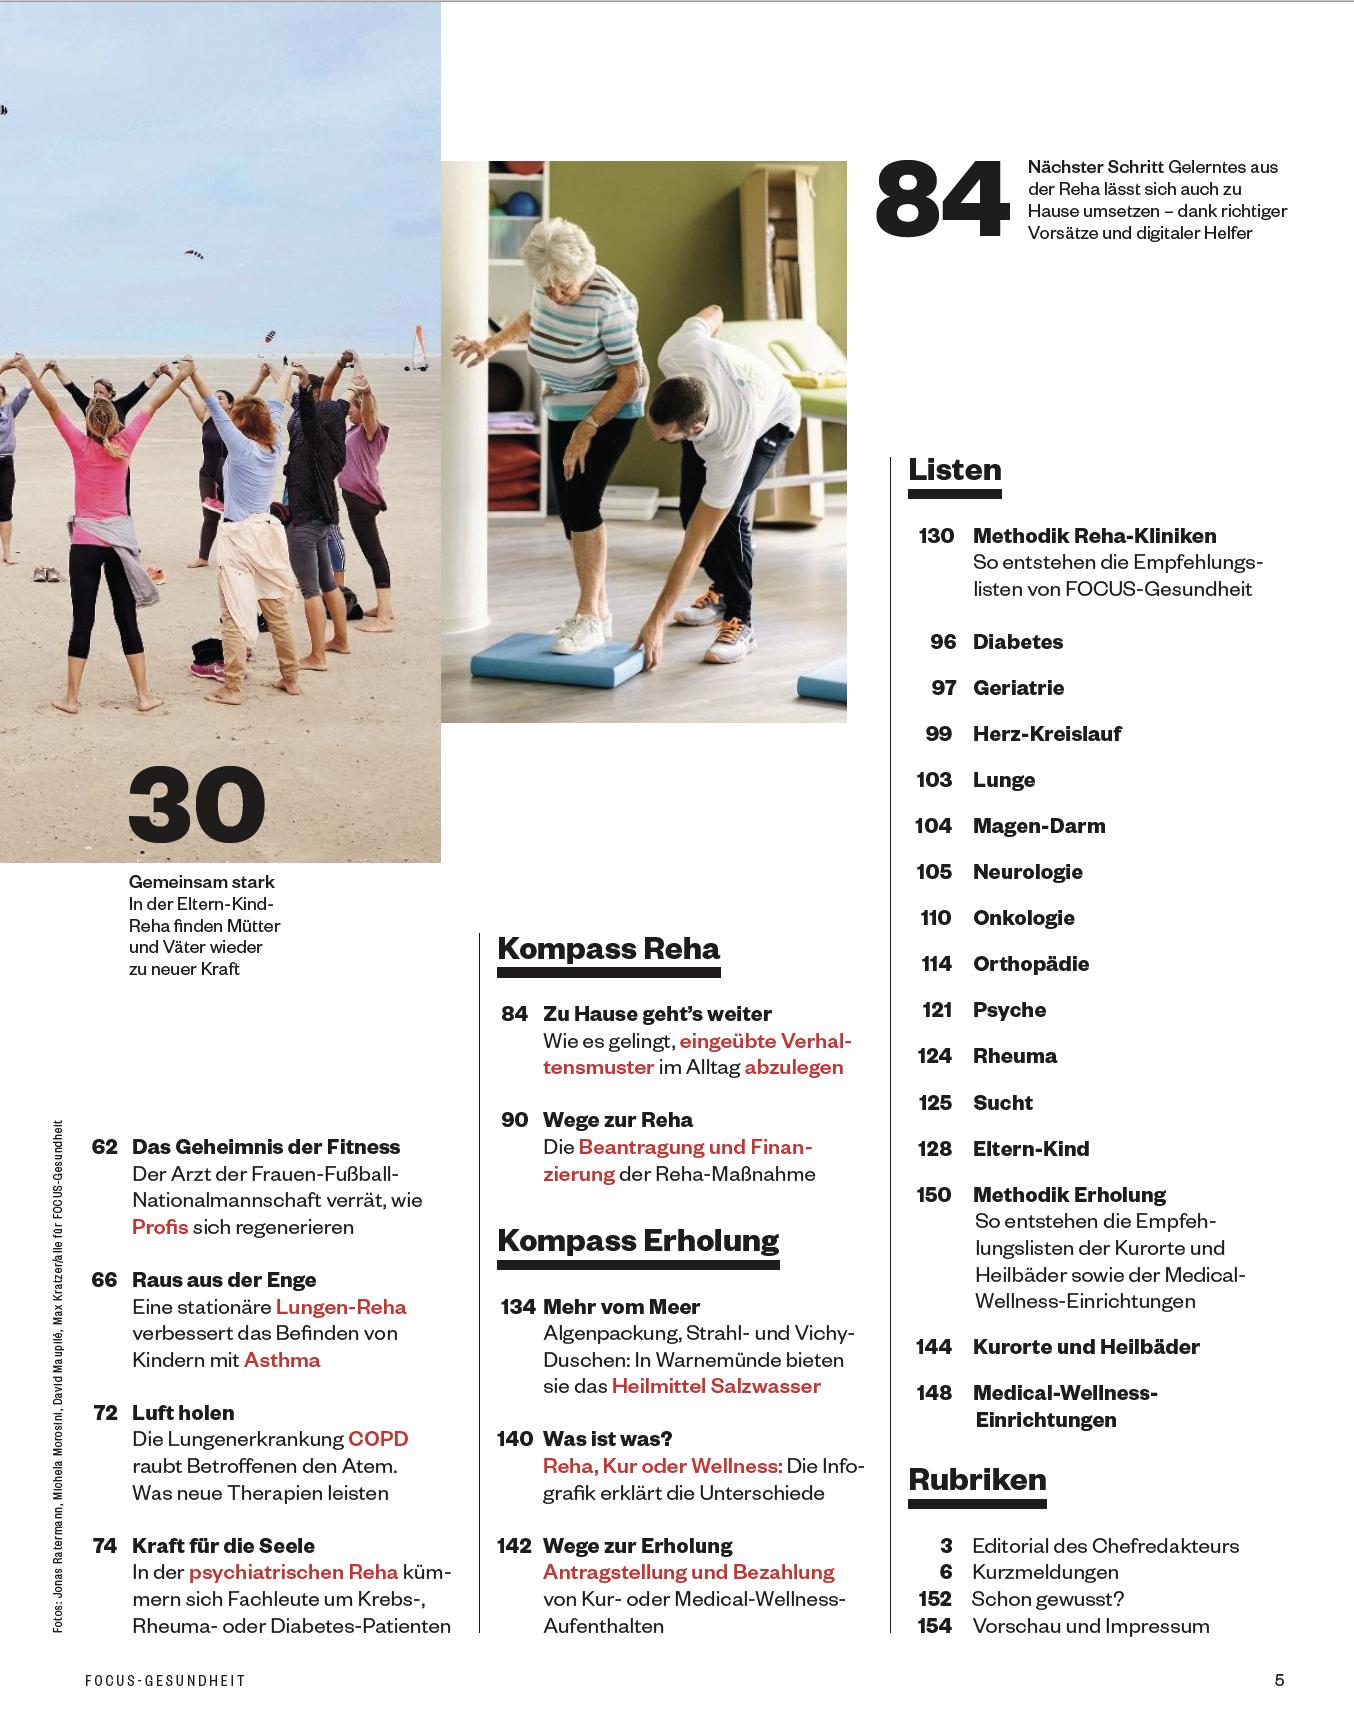 FOCUS-GESUNDHEIT FOCUS Gesundheit - Die Top-Rehakliniken 2020